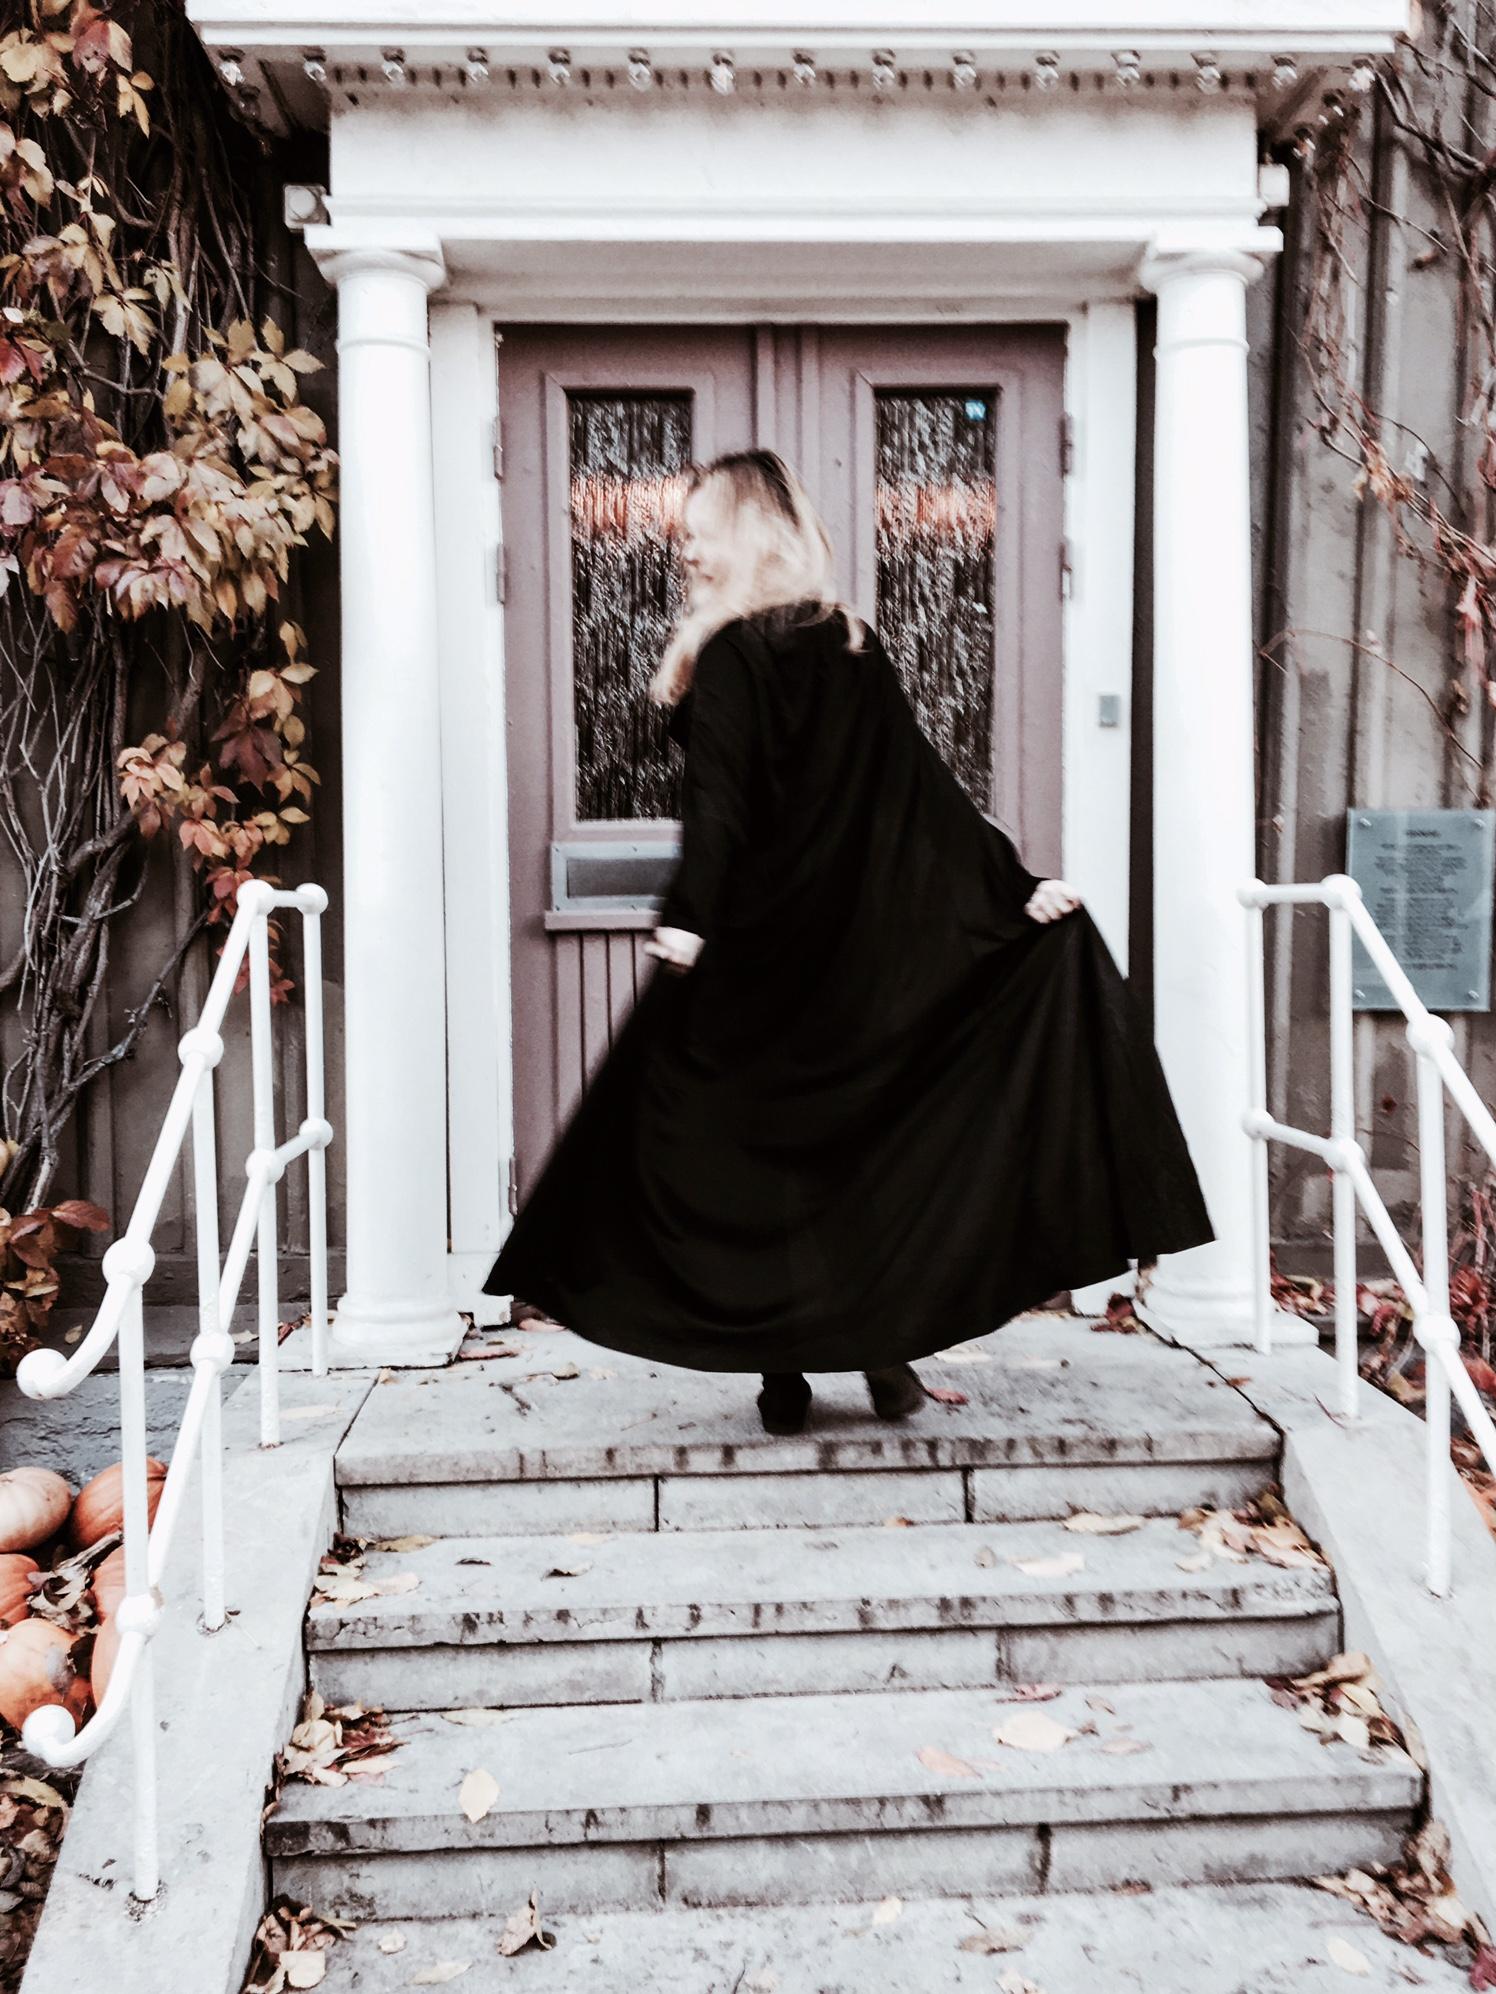 maquillage-d-halloween-3